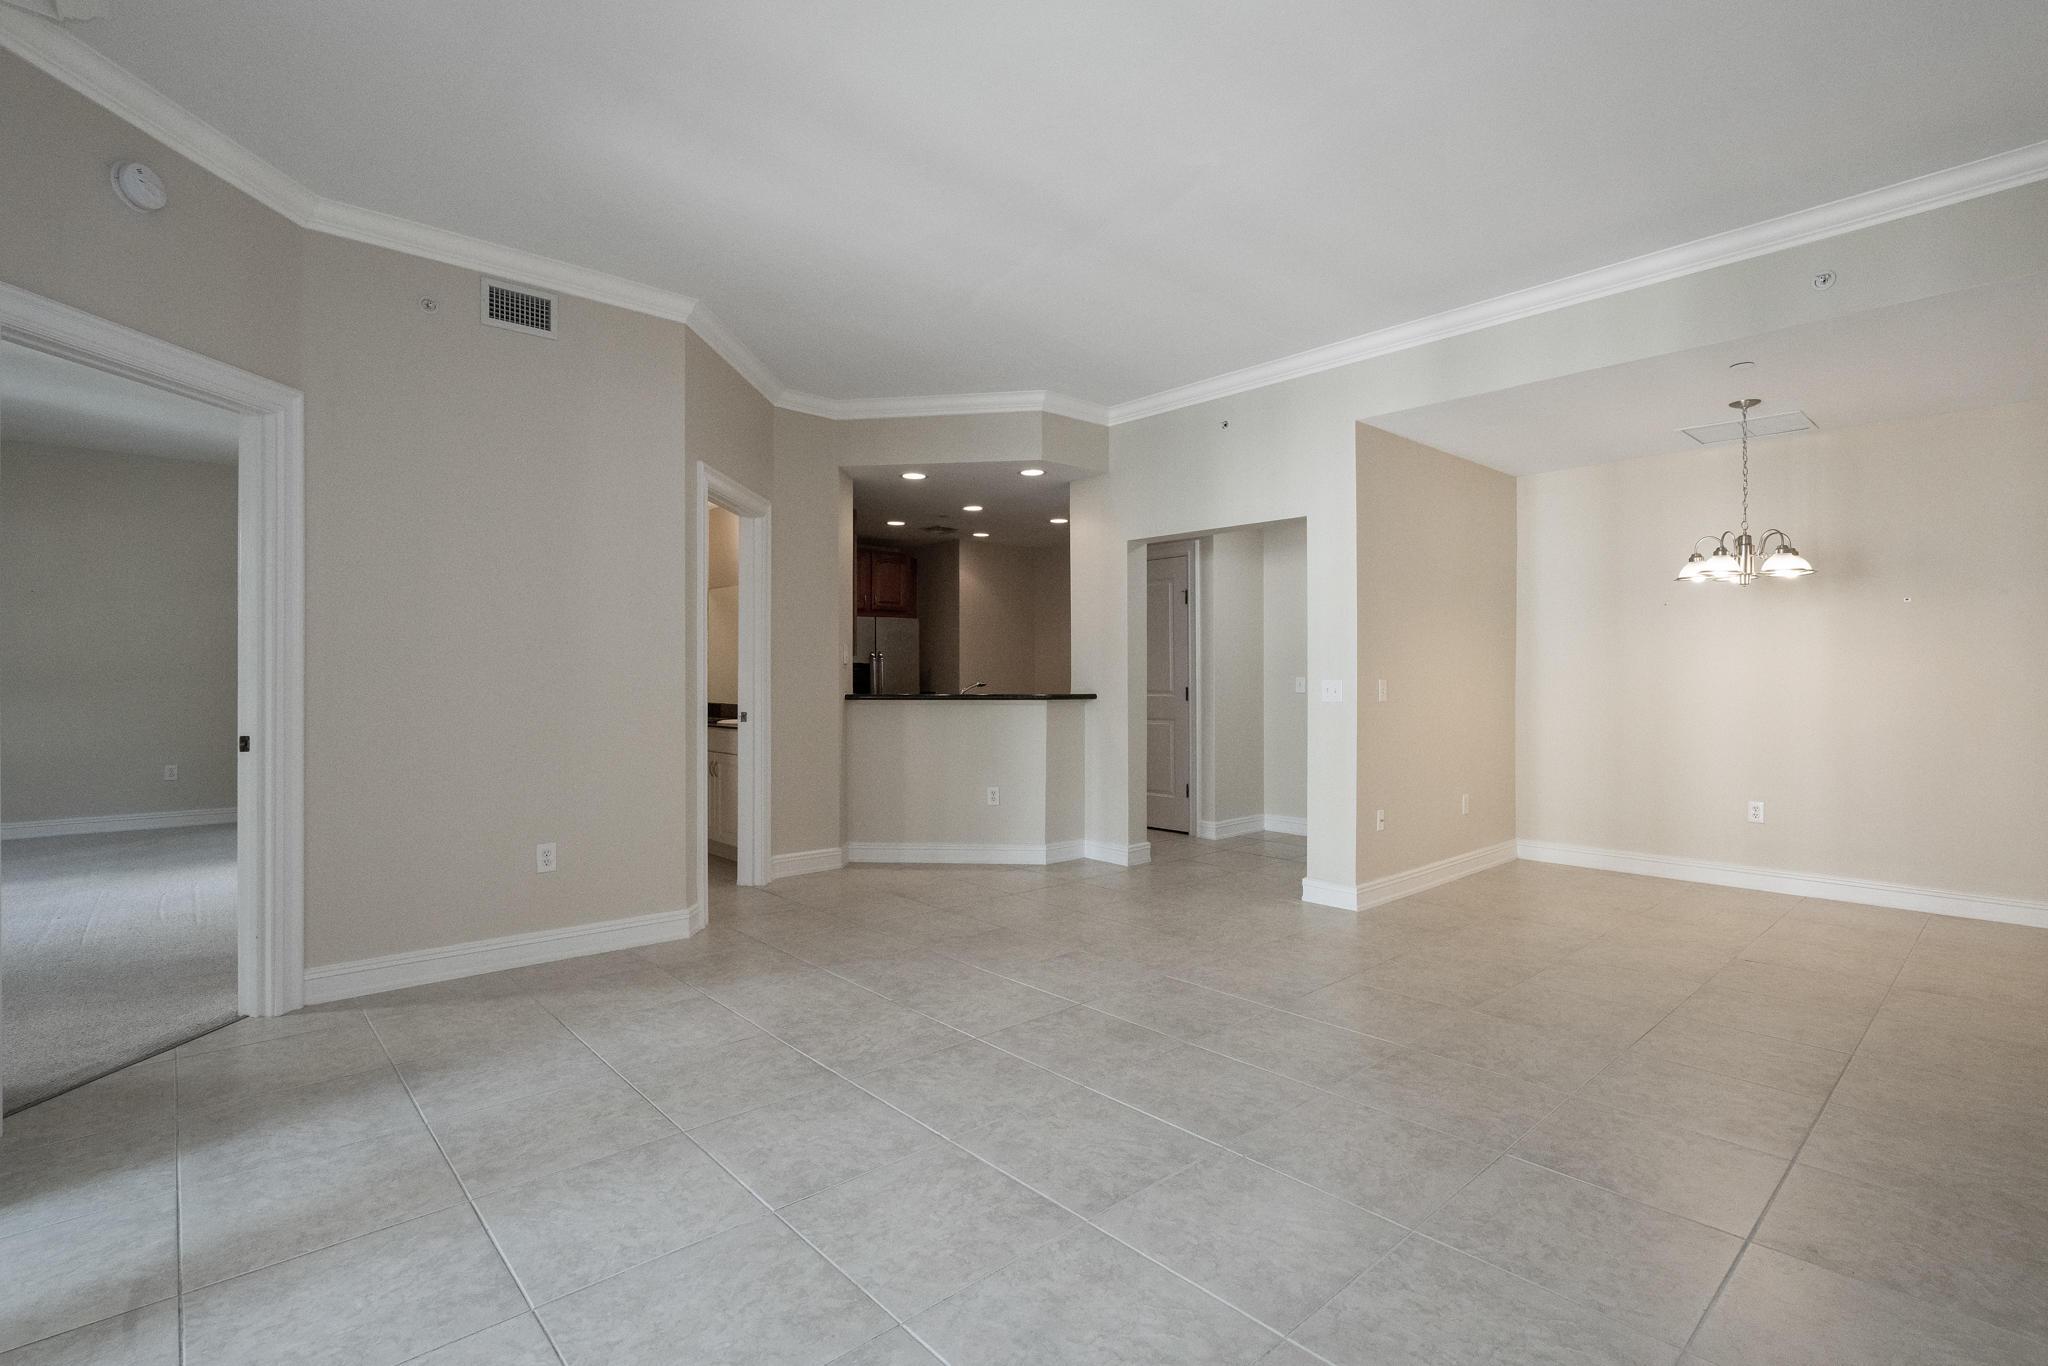 Image 16 For 16100 Emerald Estates Drive 390